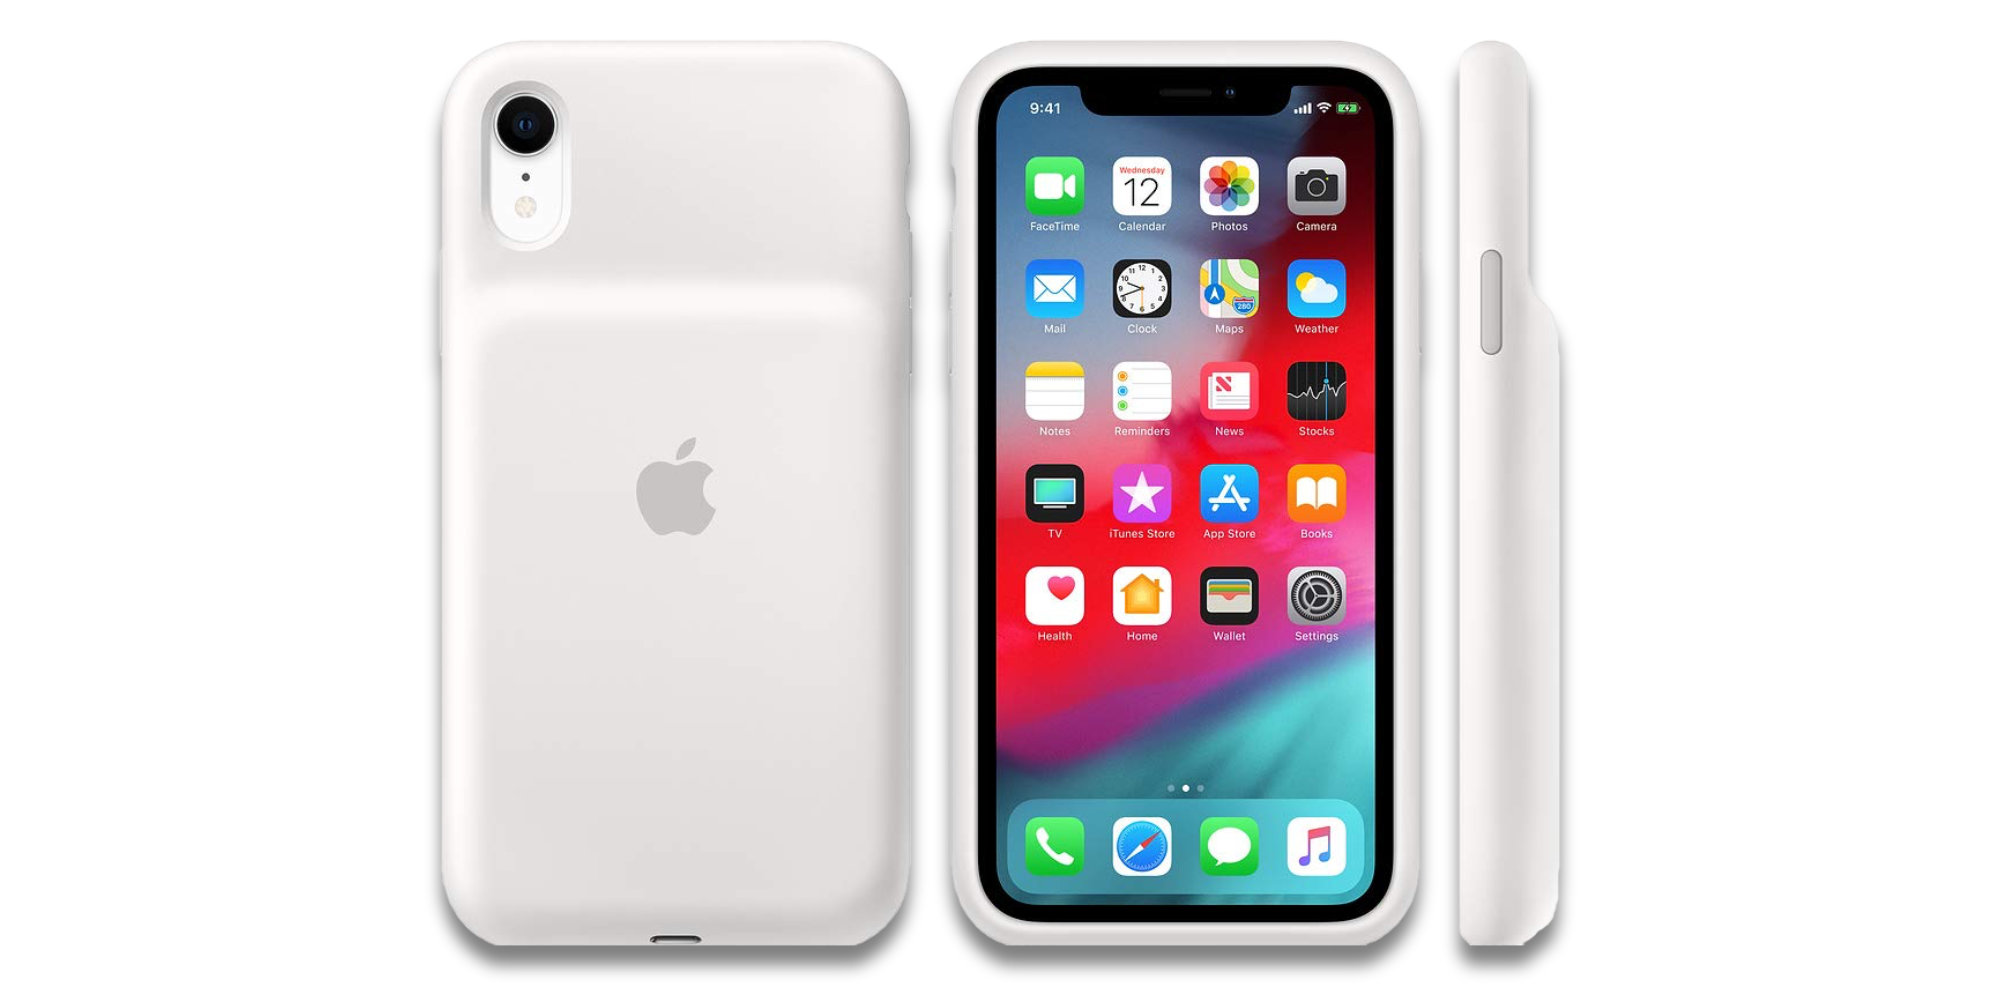 Apple's iPhone XR Smart Battery Case returns to Amazon low: $102 (Reg. $129)